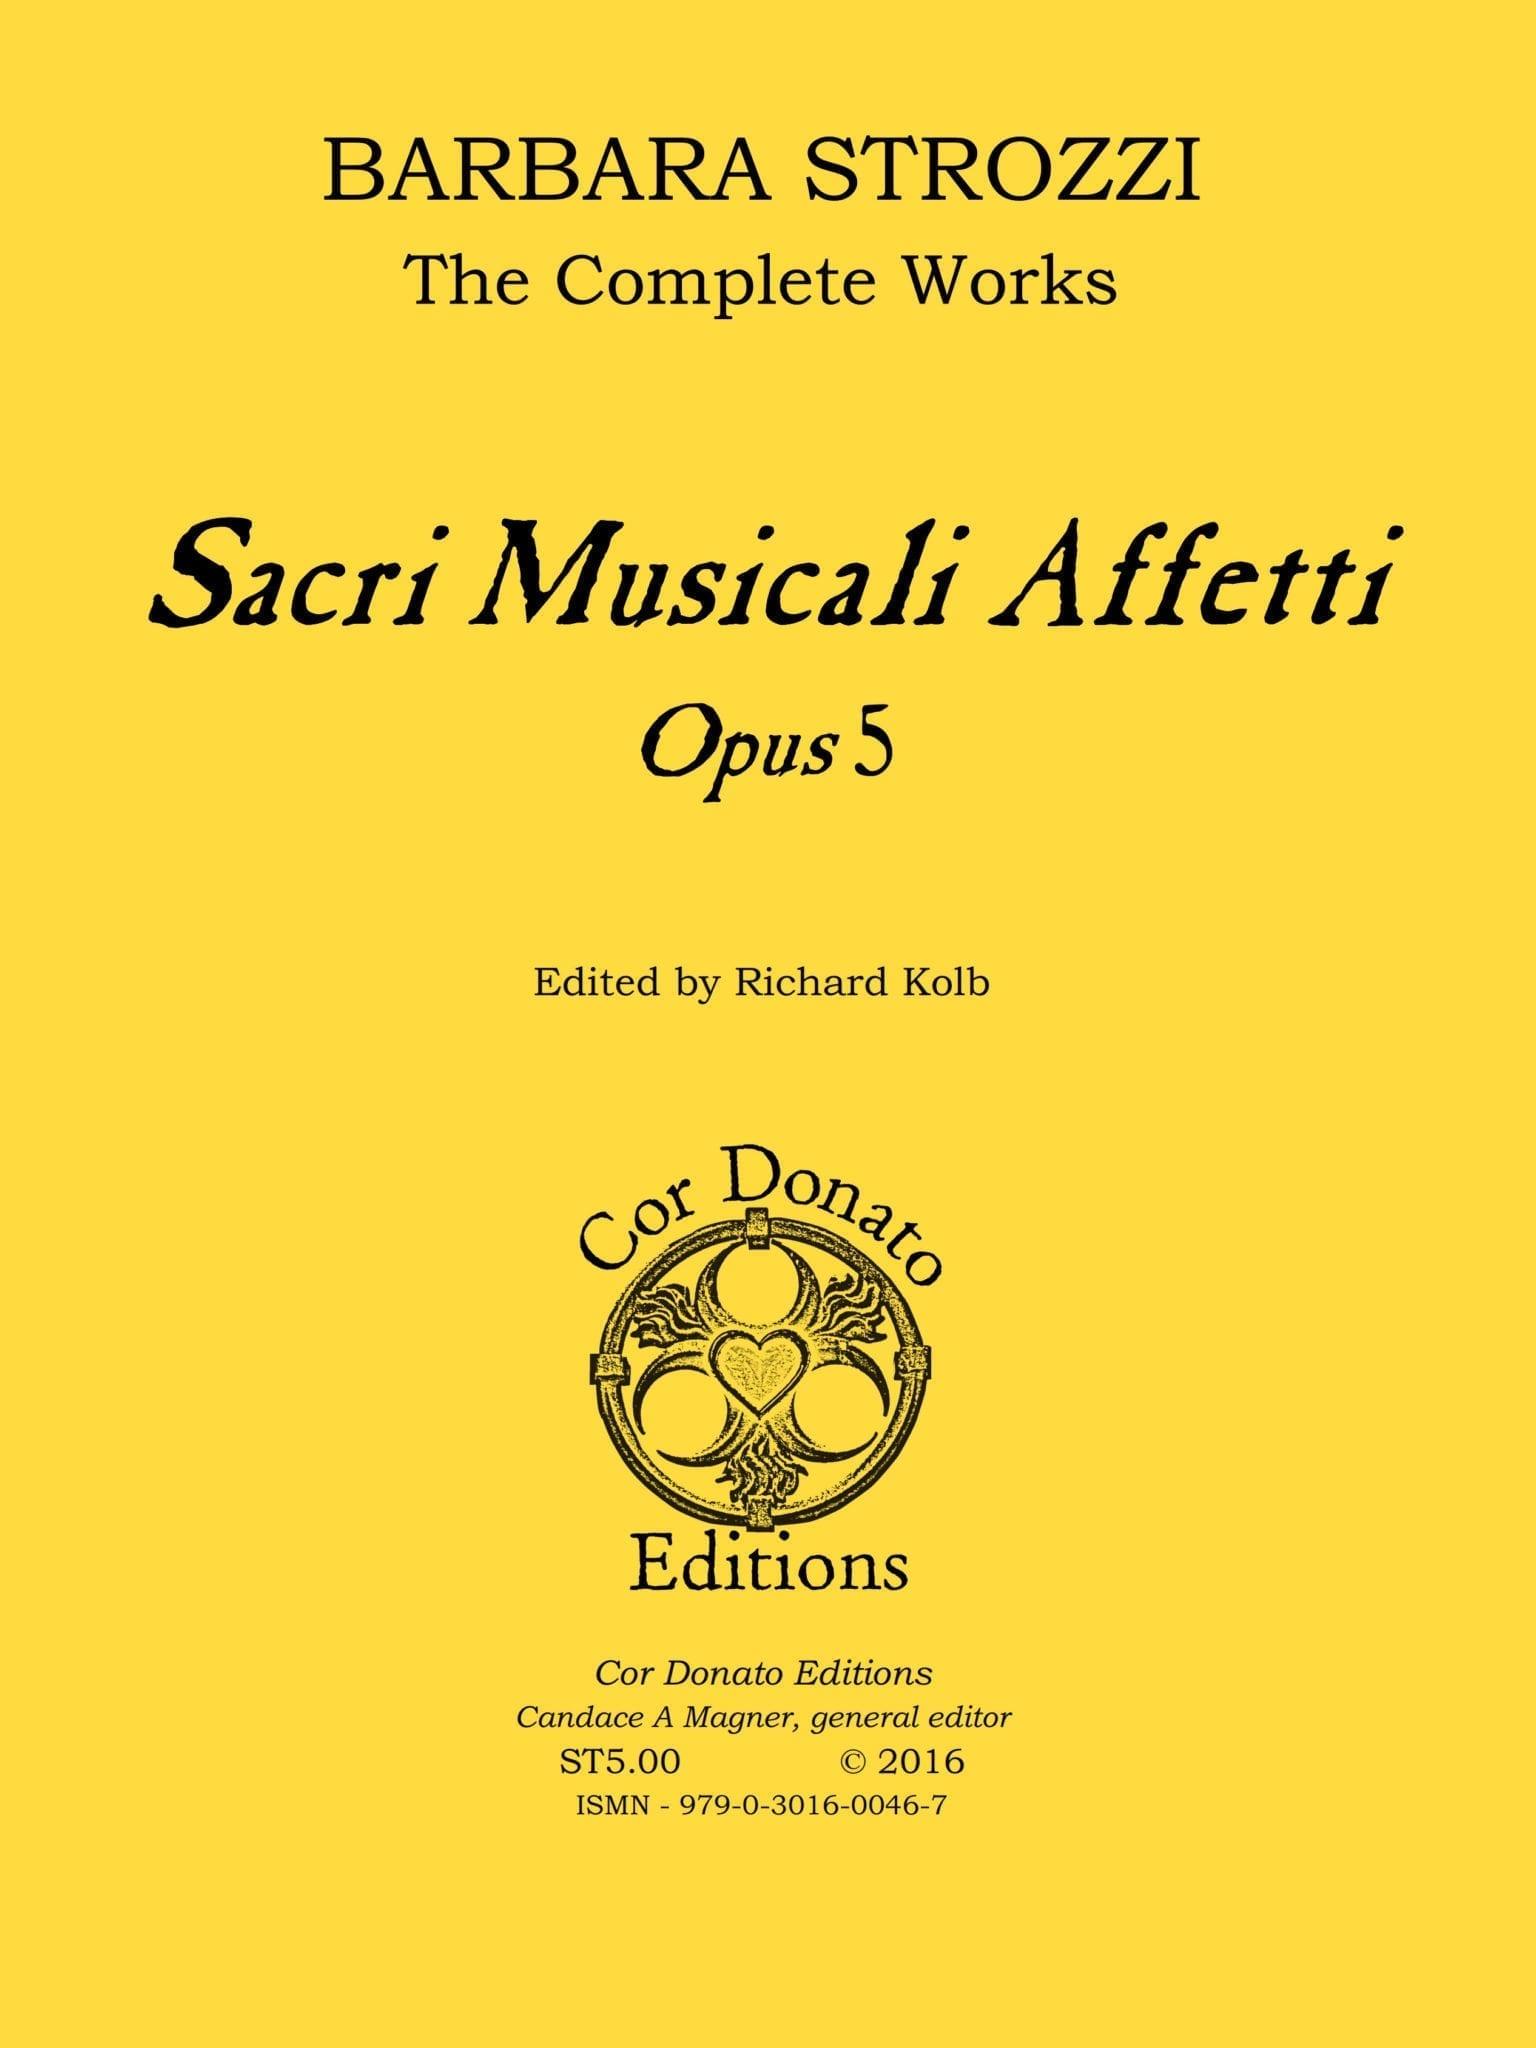 Barbara Strozzi, the Complete Works, Opus 1, Sacri Musicali Affetti